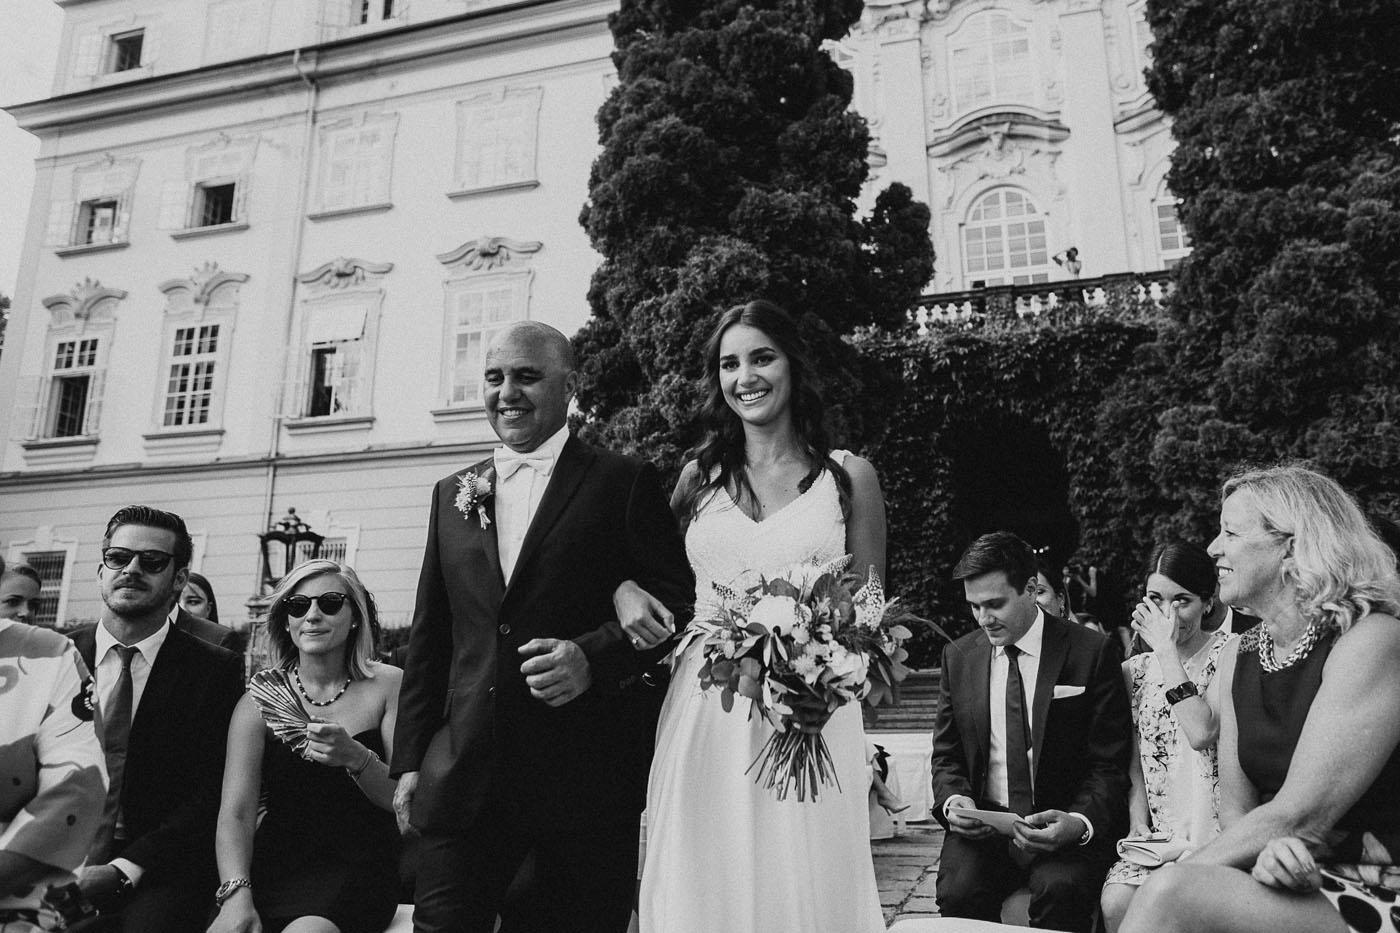 wedding-leopoldskron-photographer-22